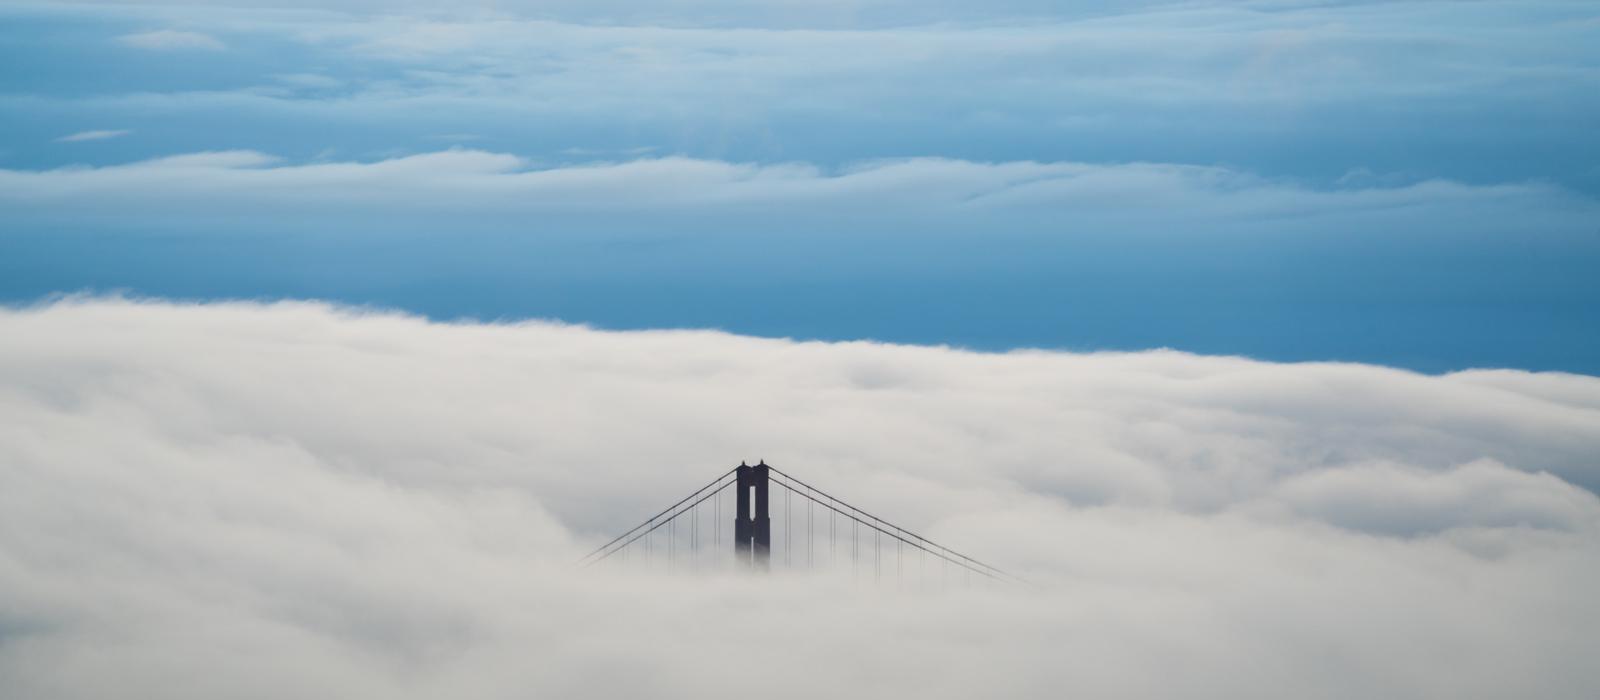 Cloud with bridge peaking above